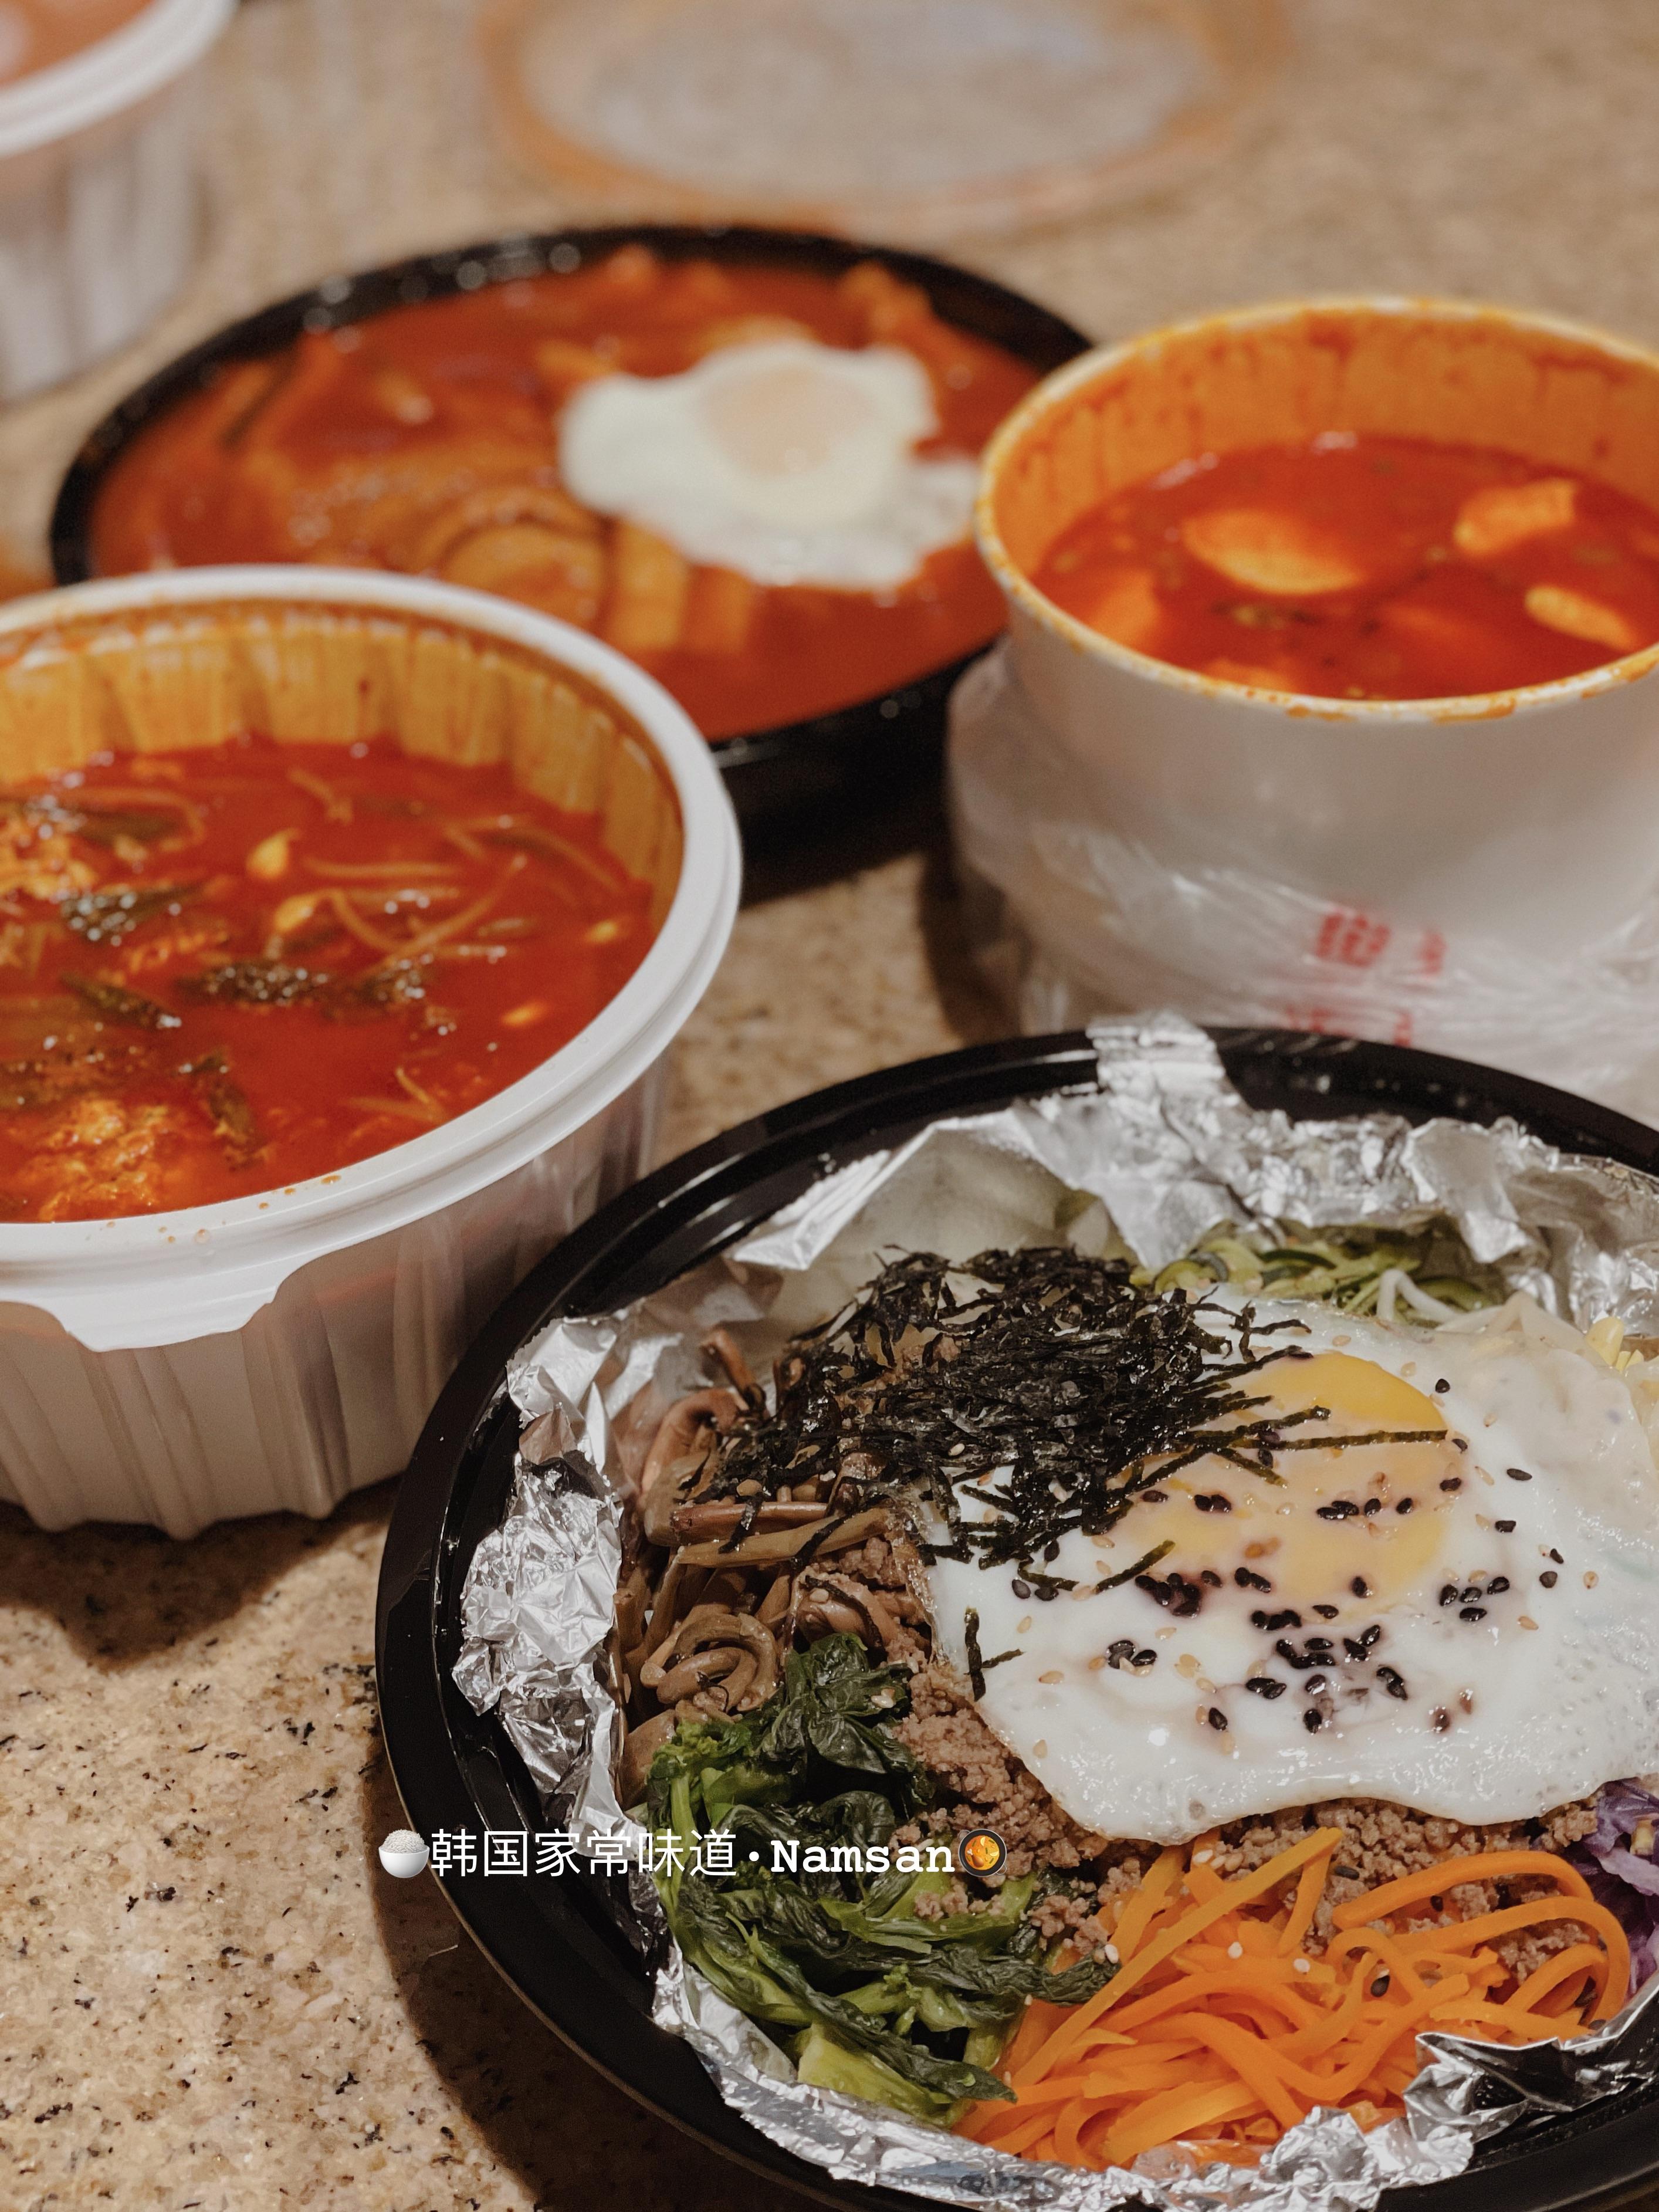 Namsan🇰🇷正宗的韩国家常味道 图1